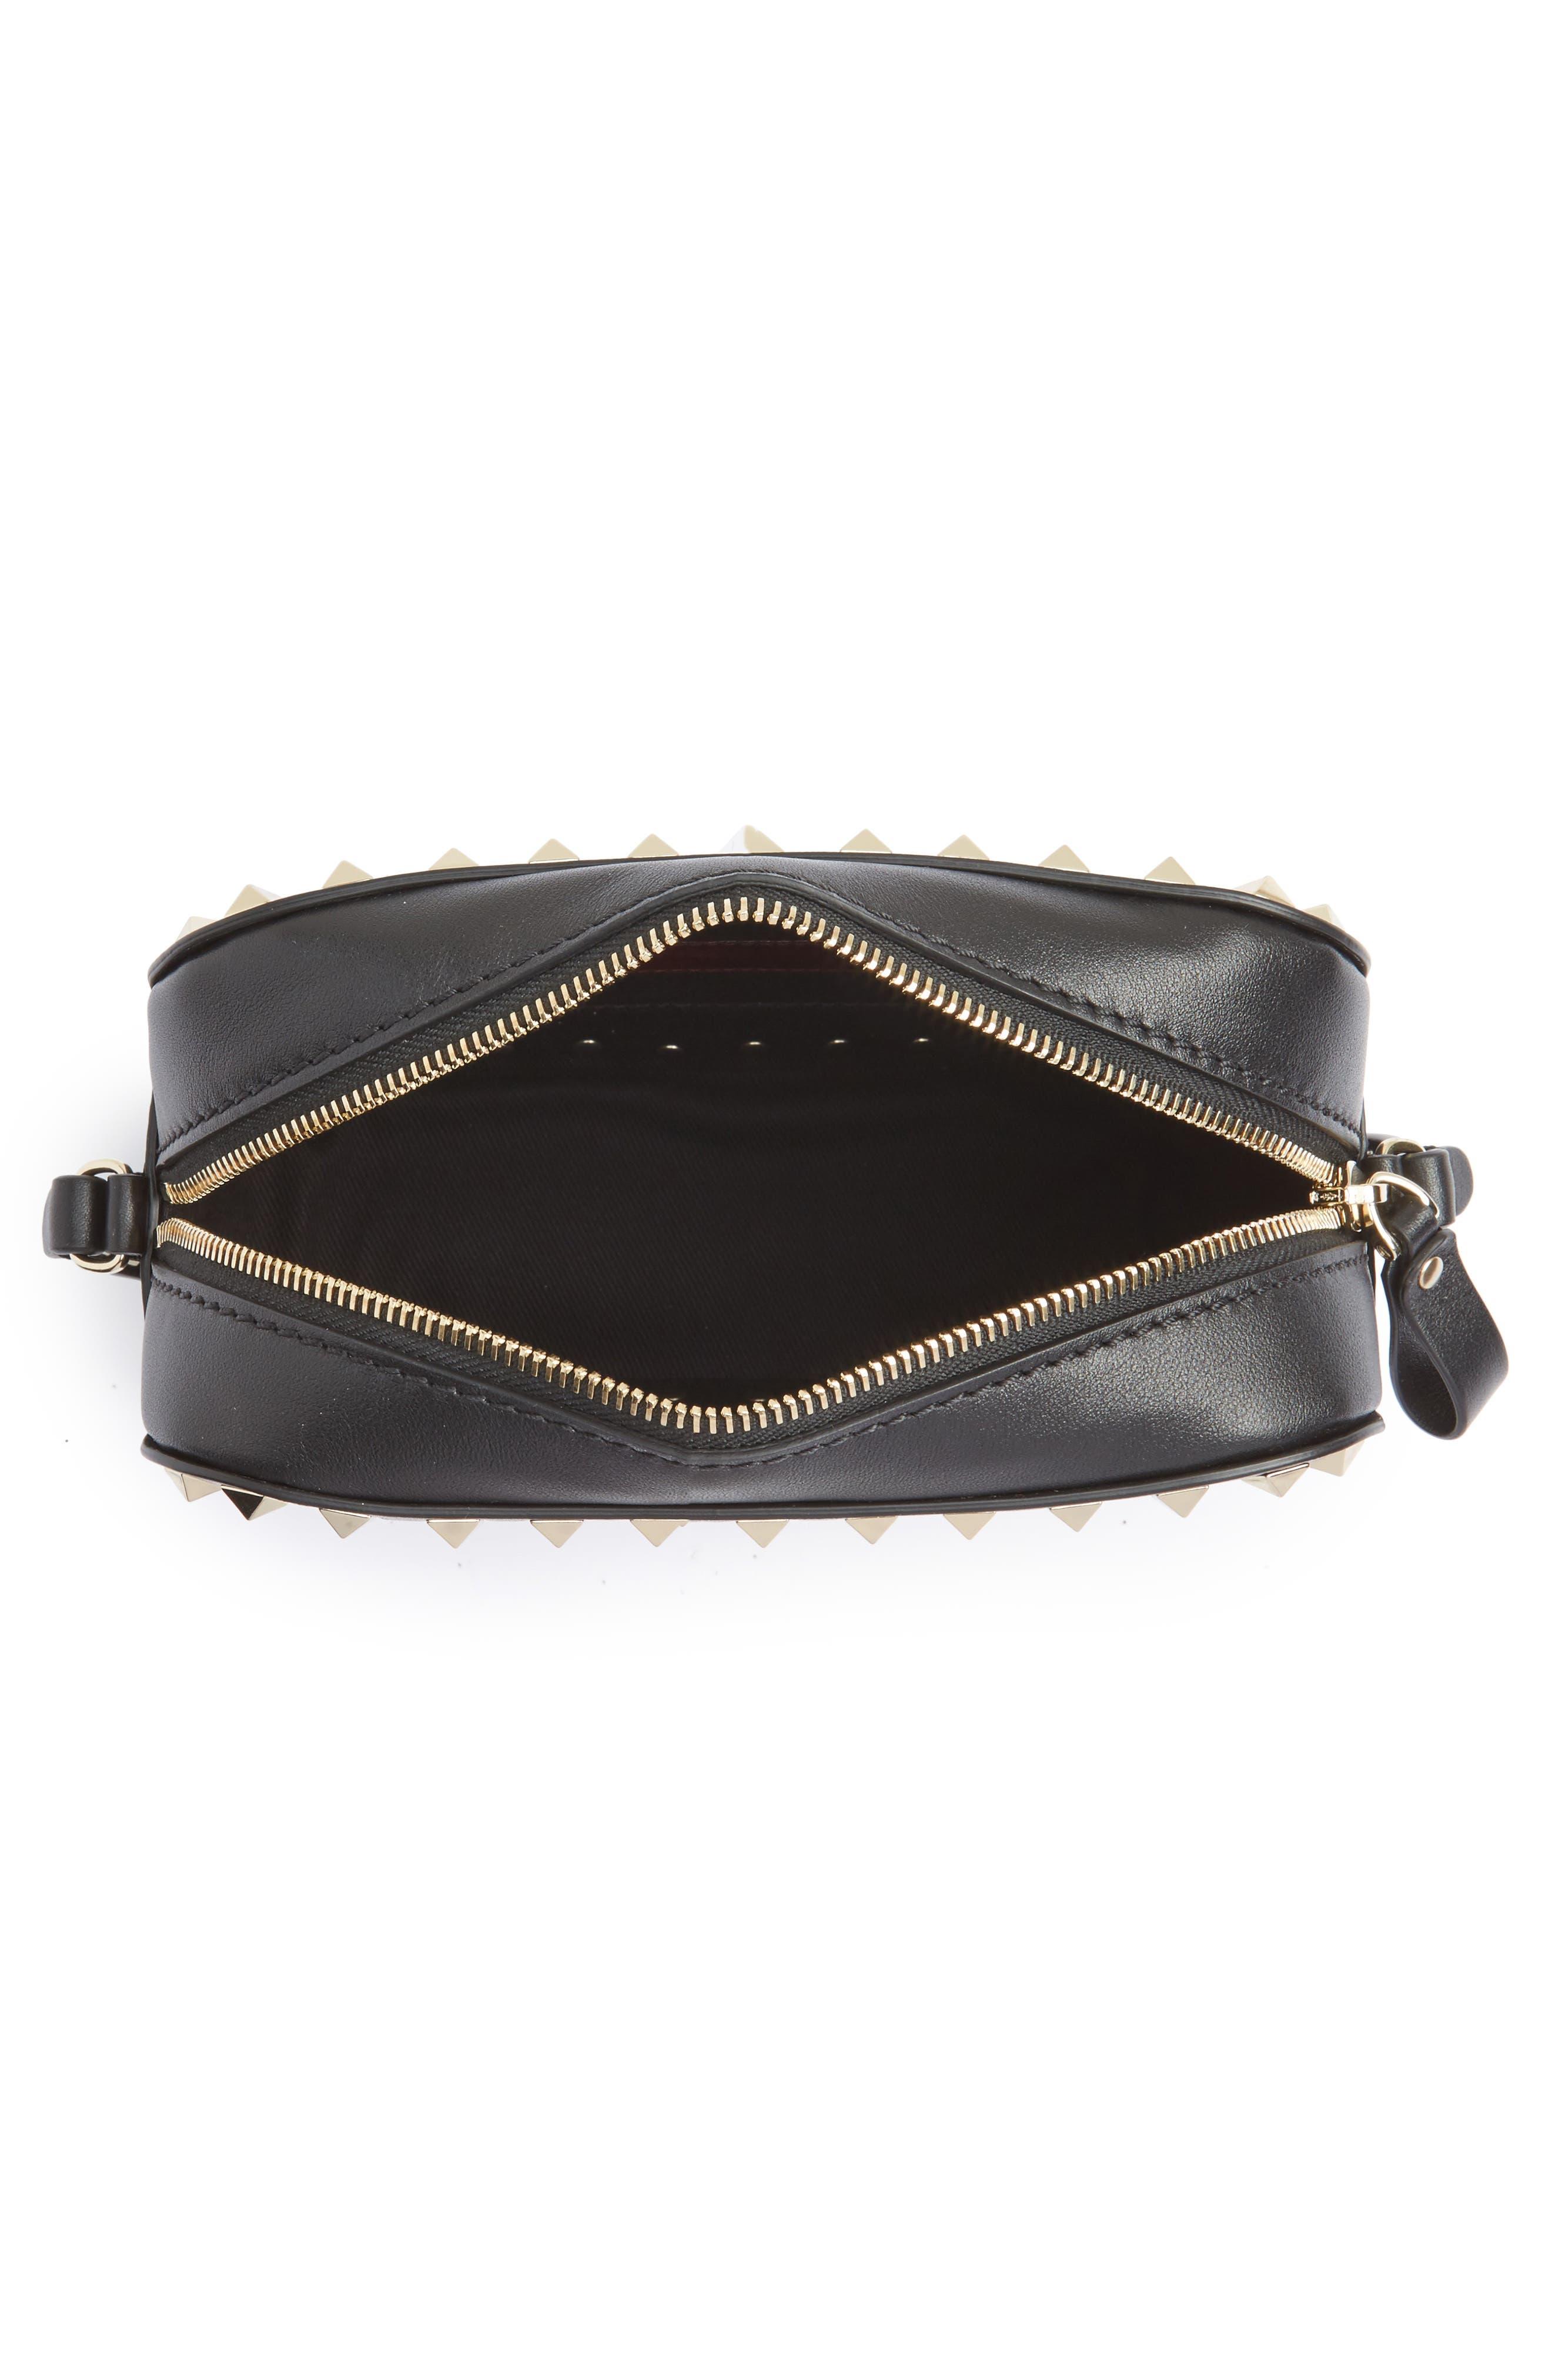 'Rockstud' Calfskin Leather Camera Crossbody Bag,                             Alternate thumbnail 3, color,                             NERO